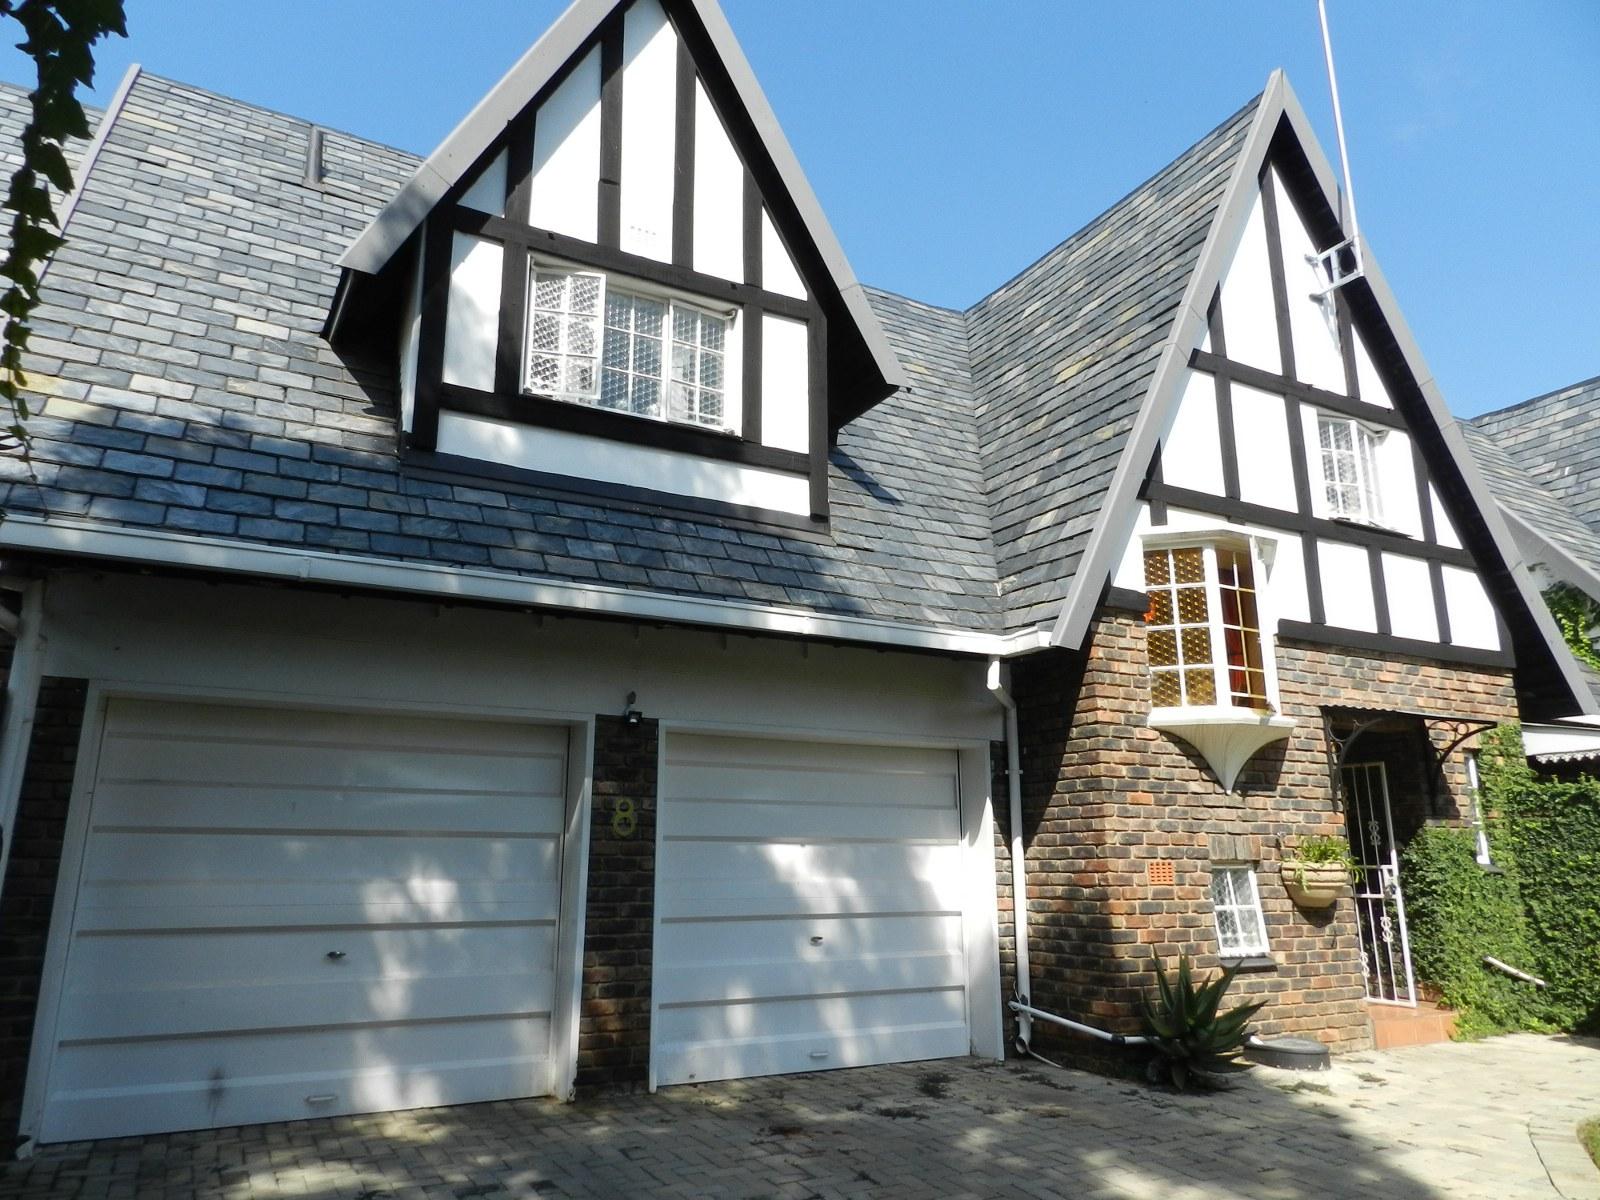 3 BedroomTownhouse For Sale In Grimbeeck Park